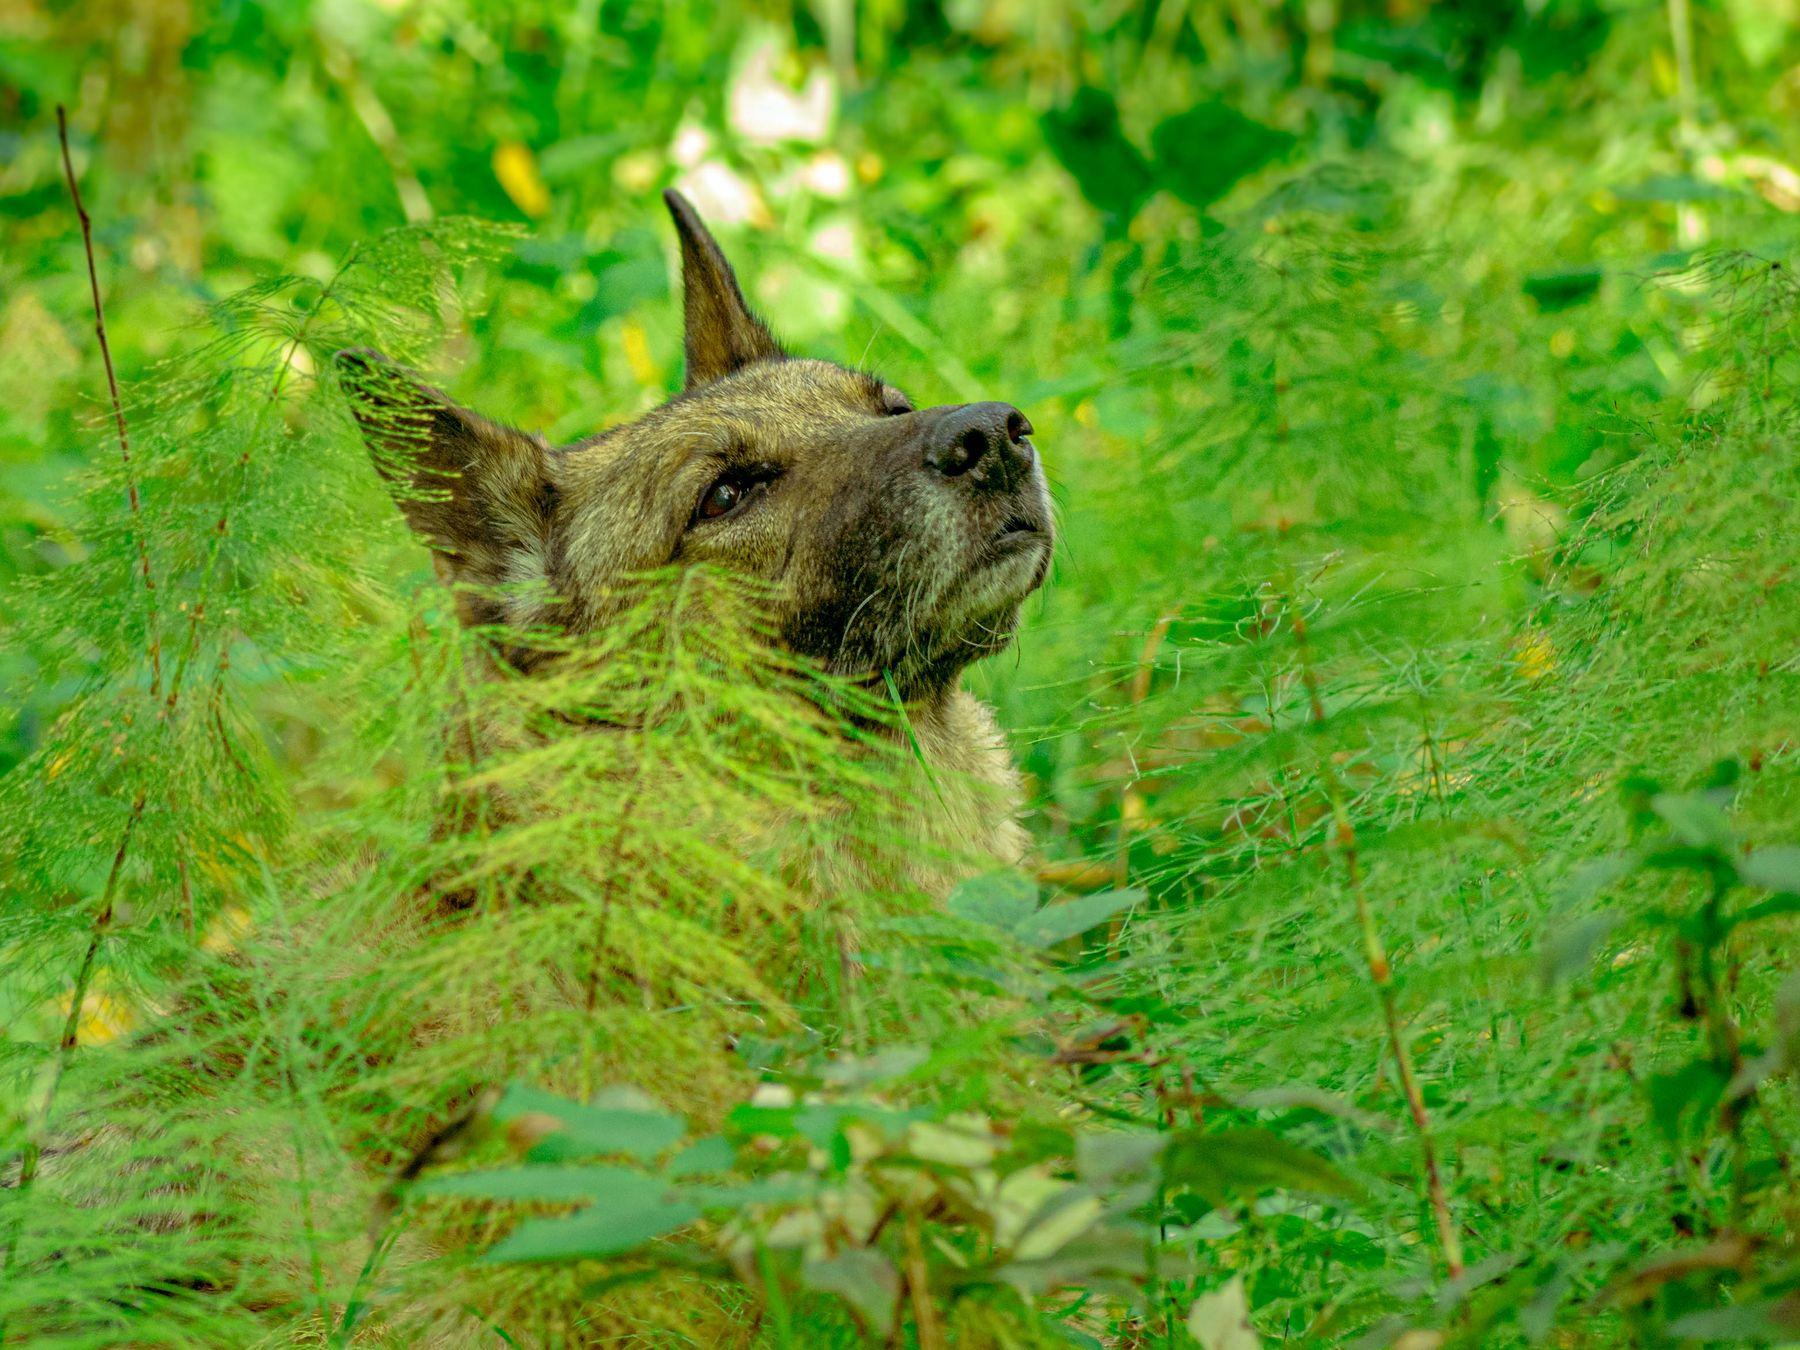 Дуся слушает тишину леса Собака лес